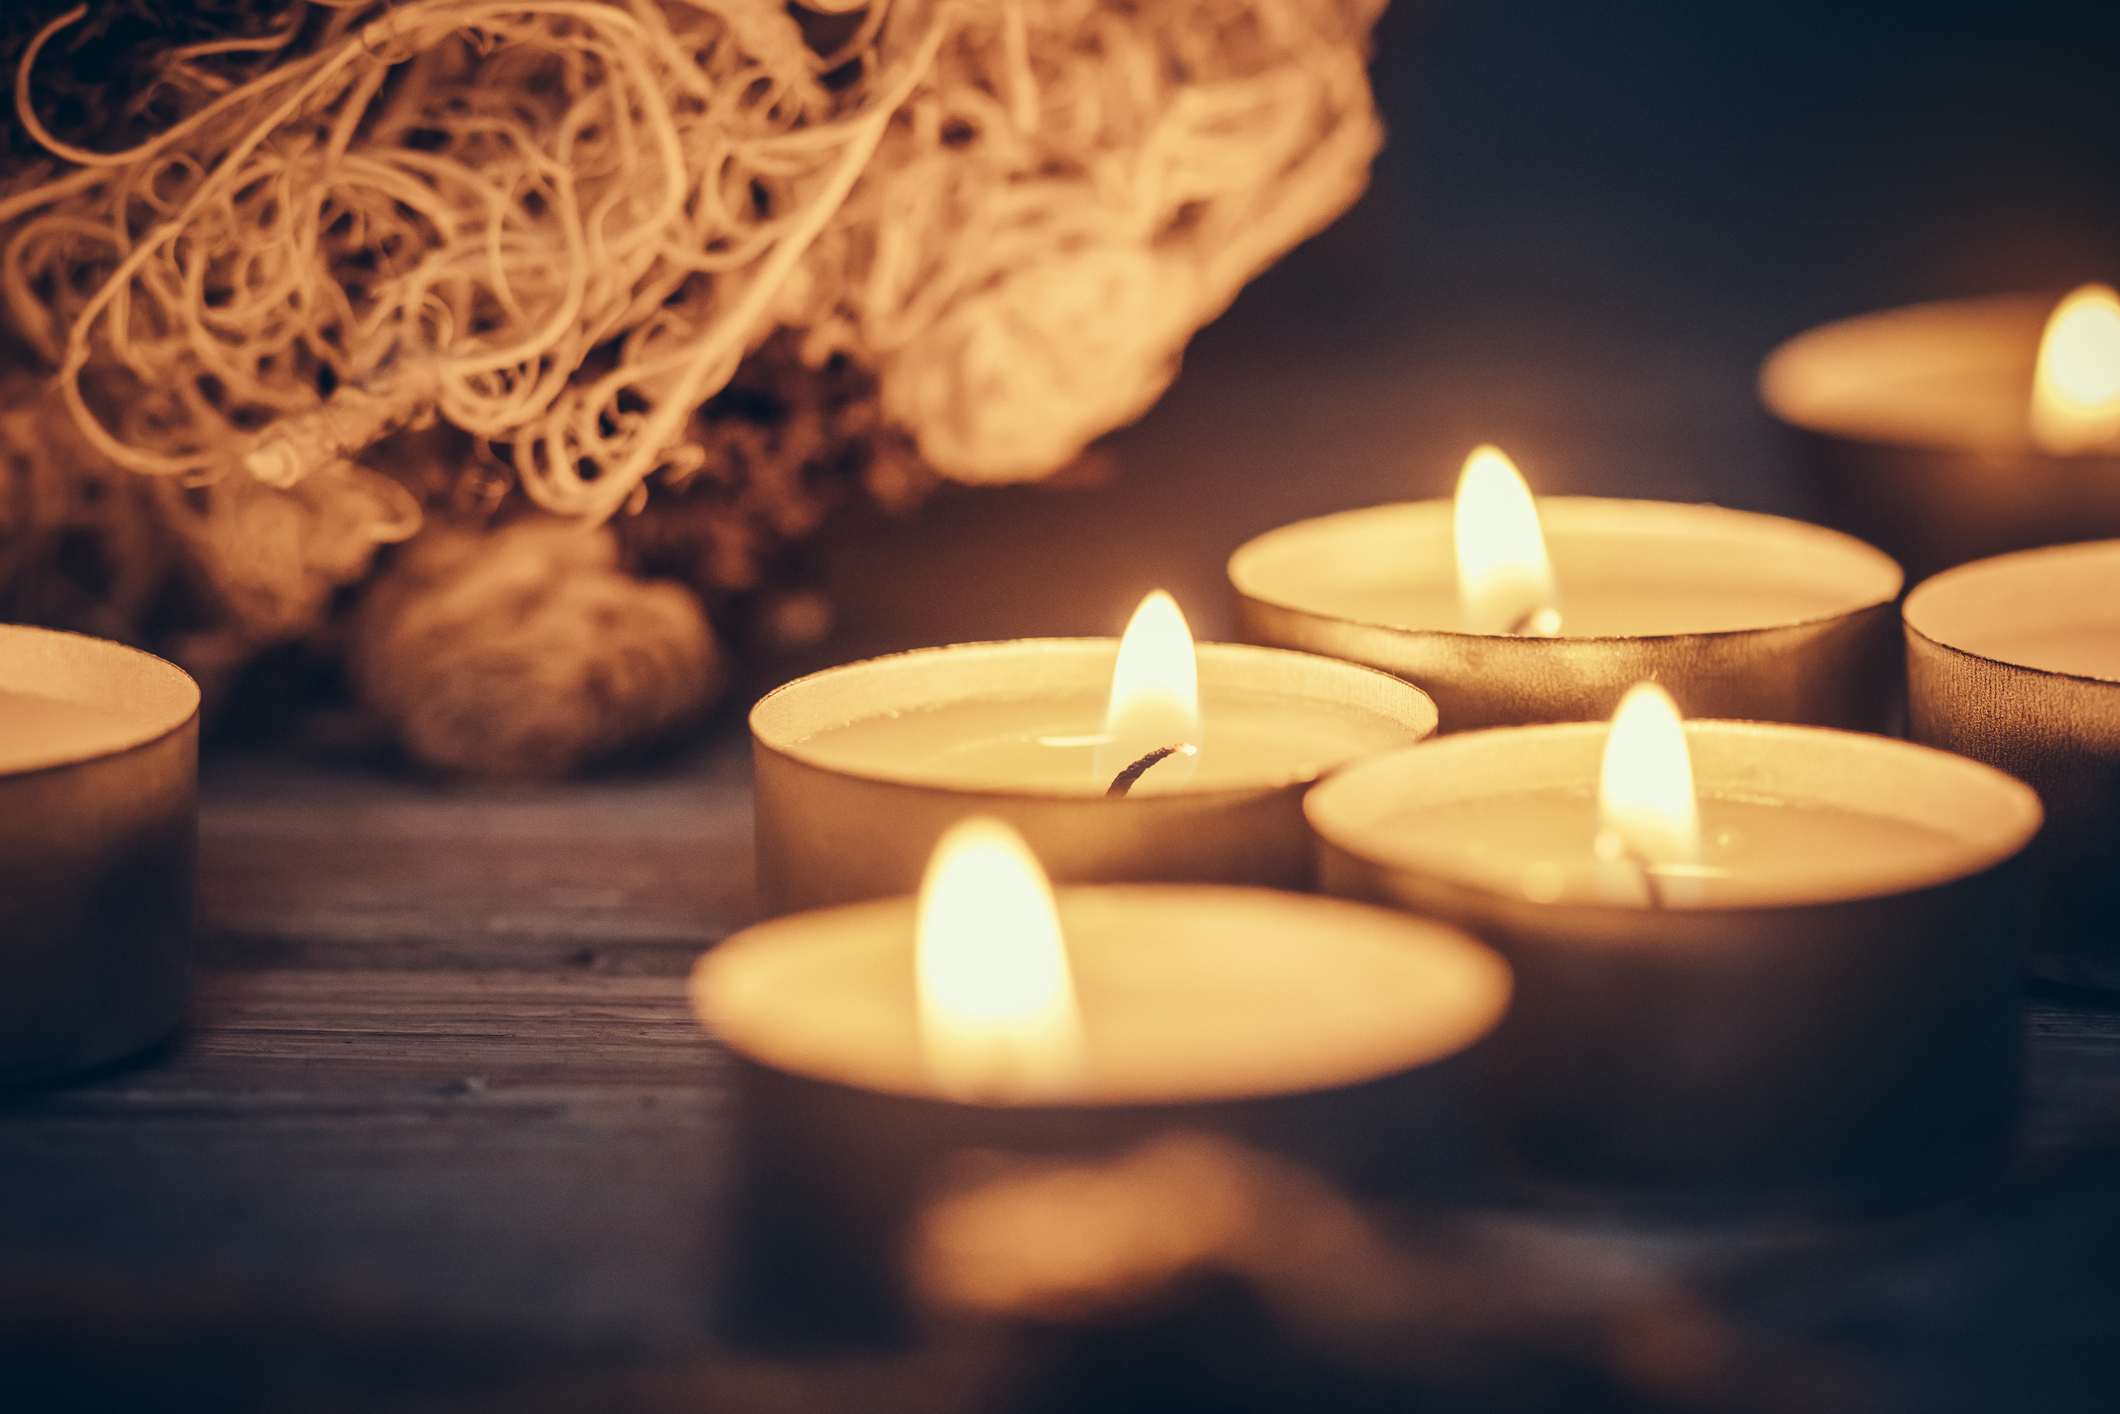 Holiday candles. Symbol of hope. Stock photo.